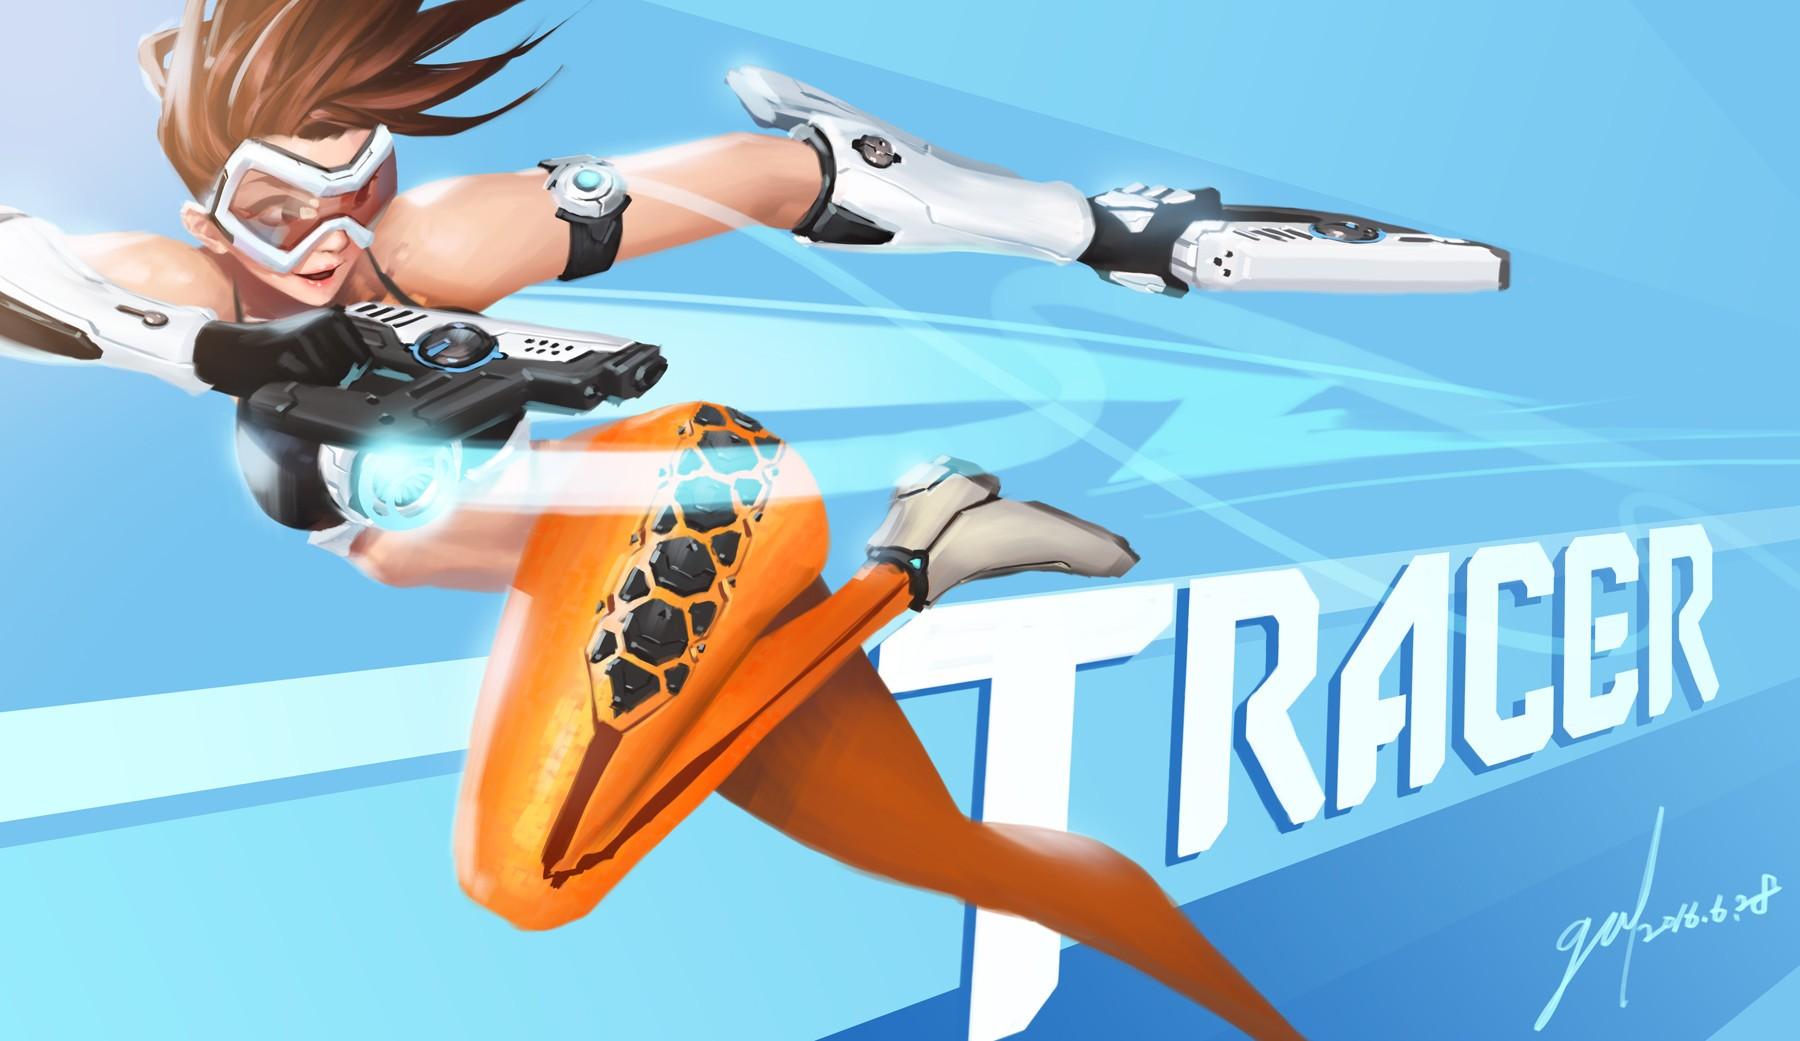 Wallpaper : illustration, anime, cartoon, graphic design ...